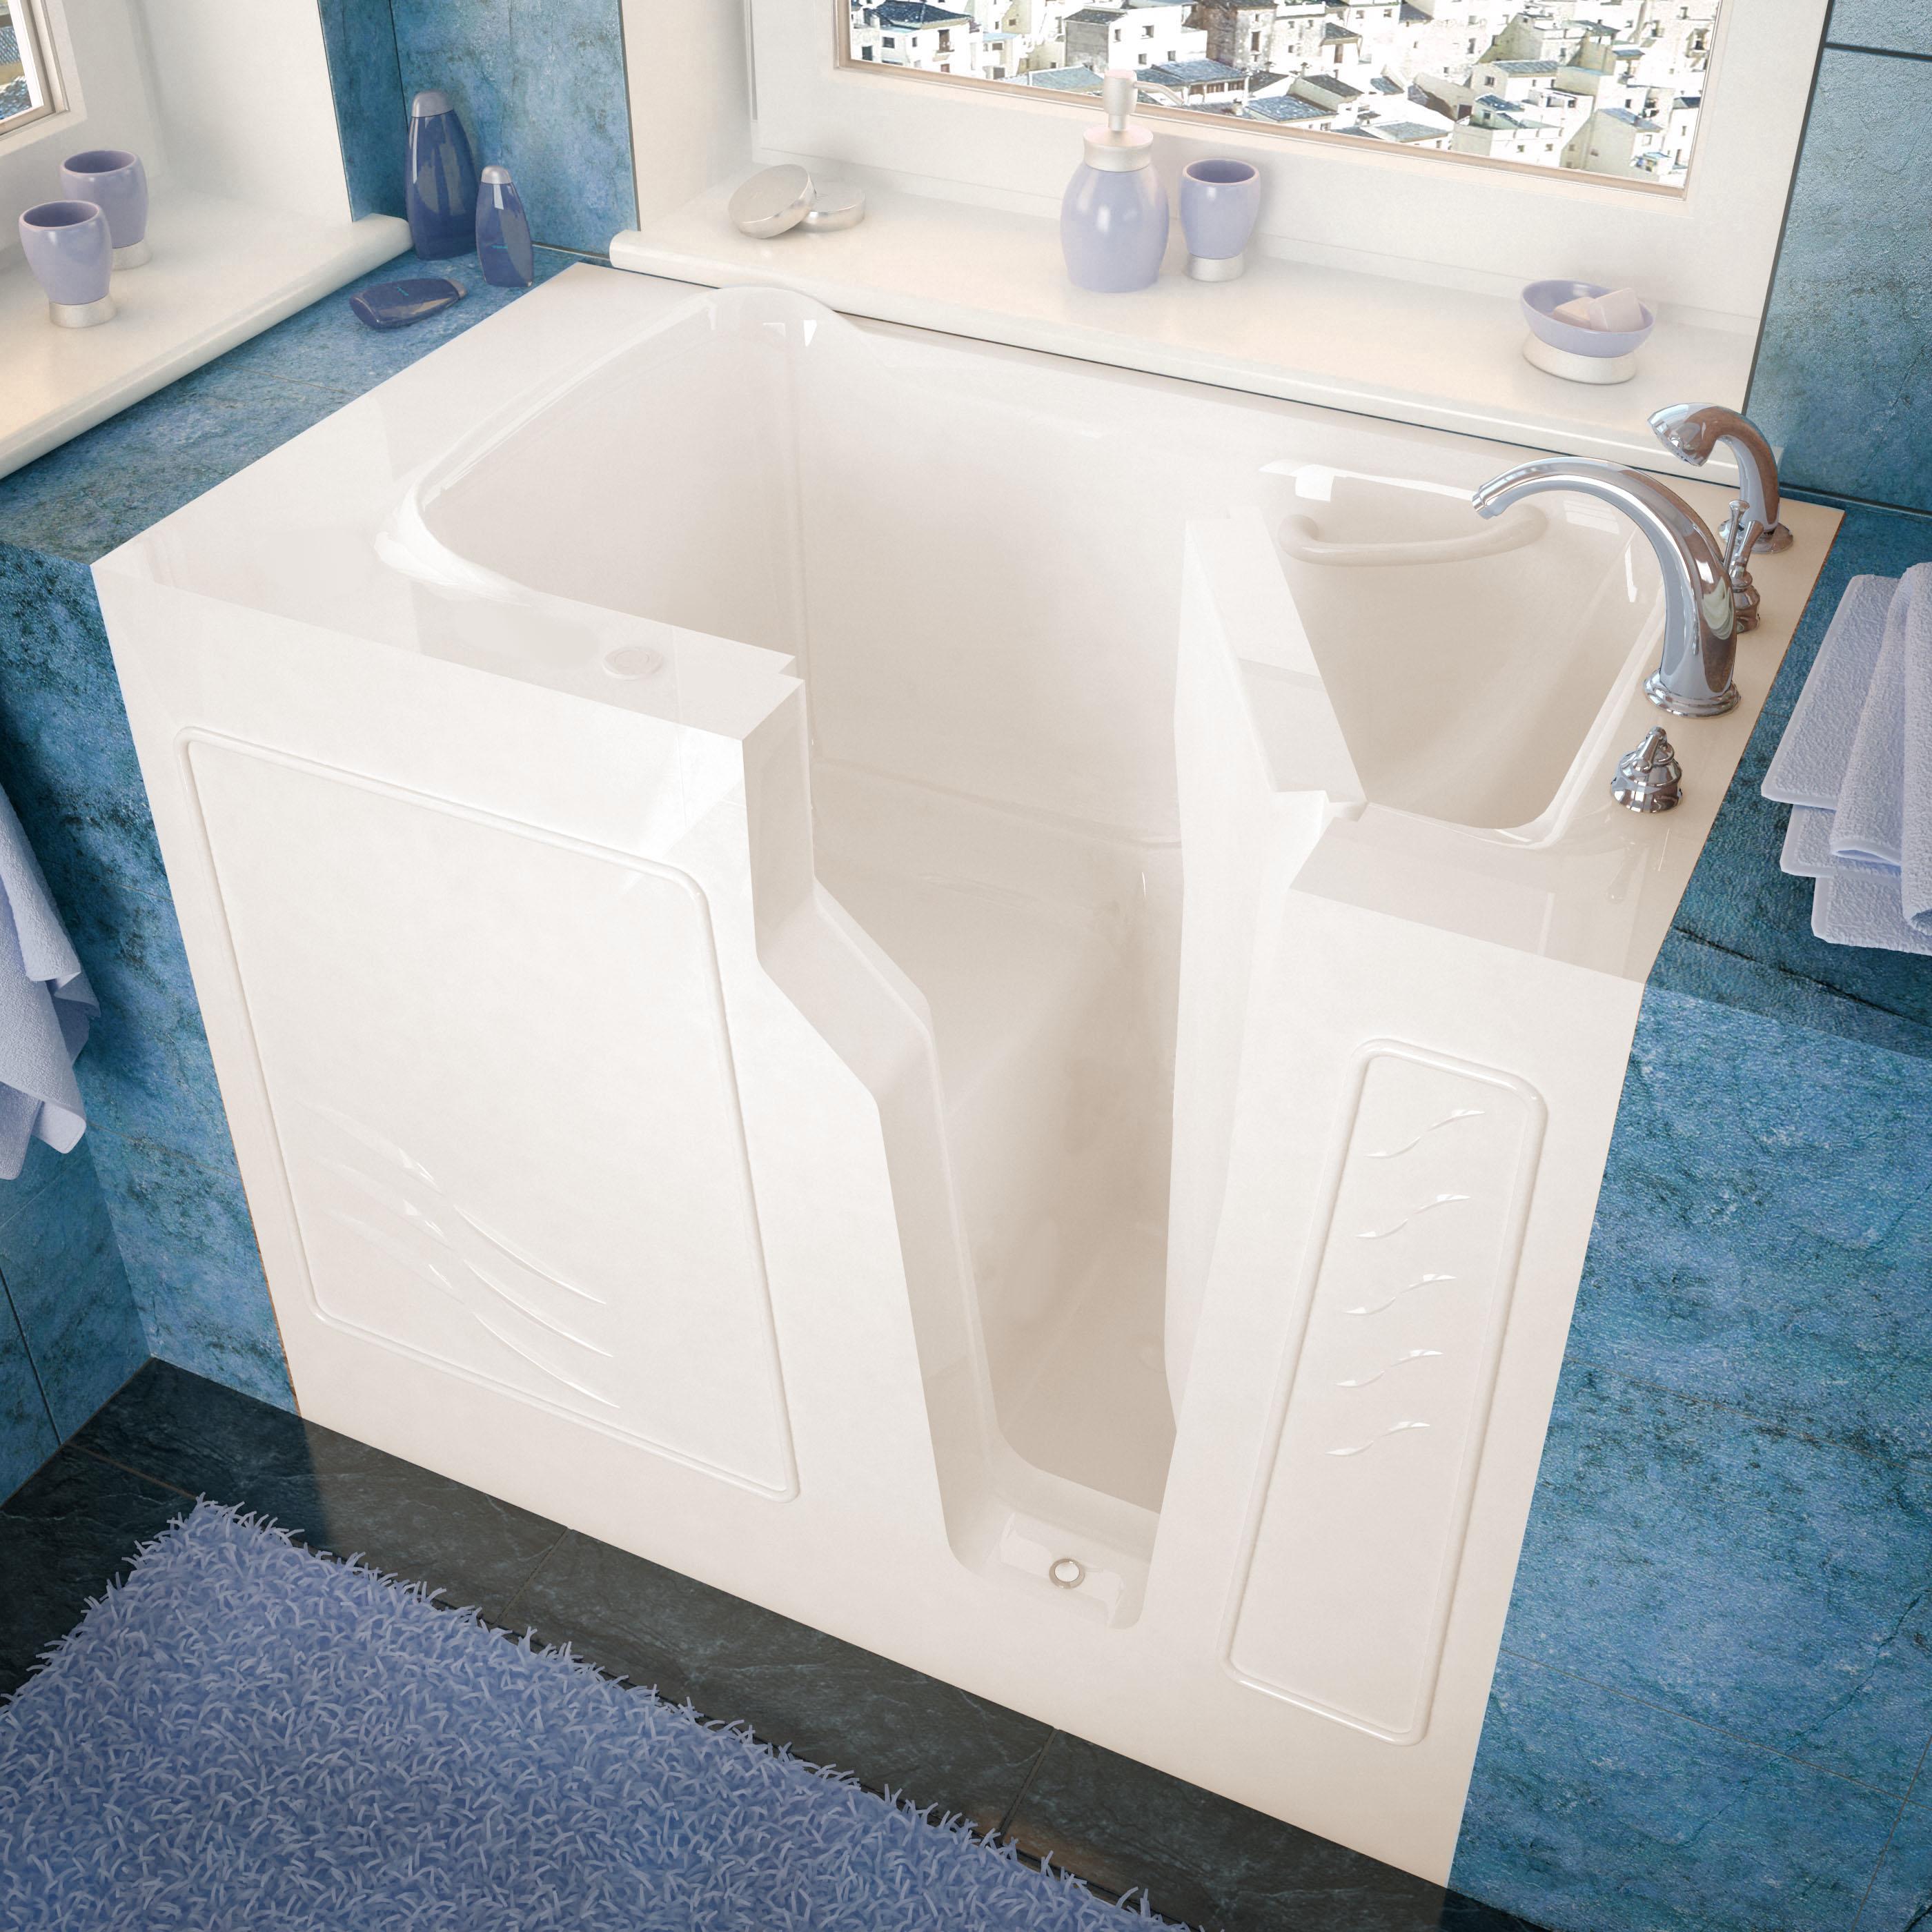 26x46 Right Drain Biscuit Soaking Walk-In Bathtub